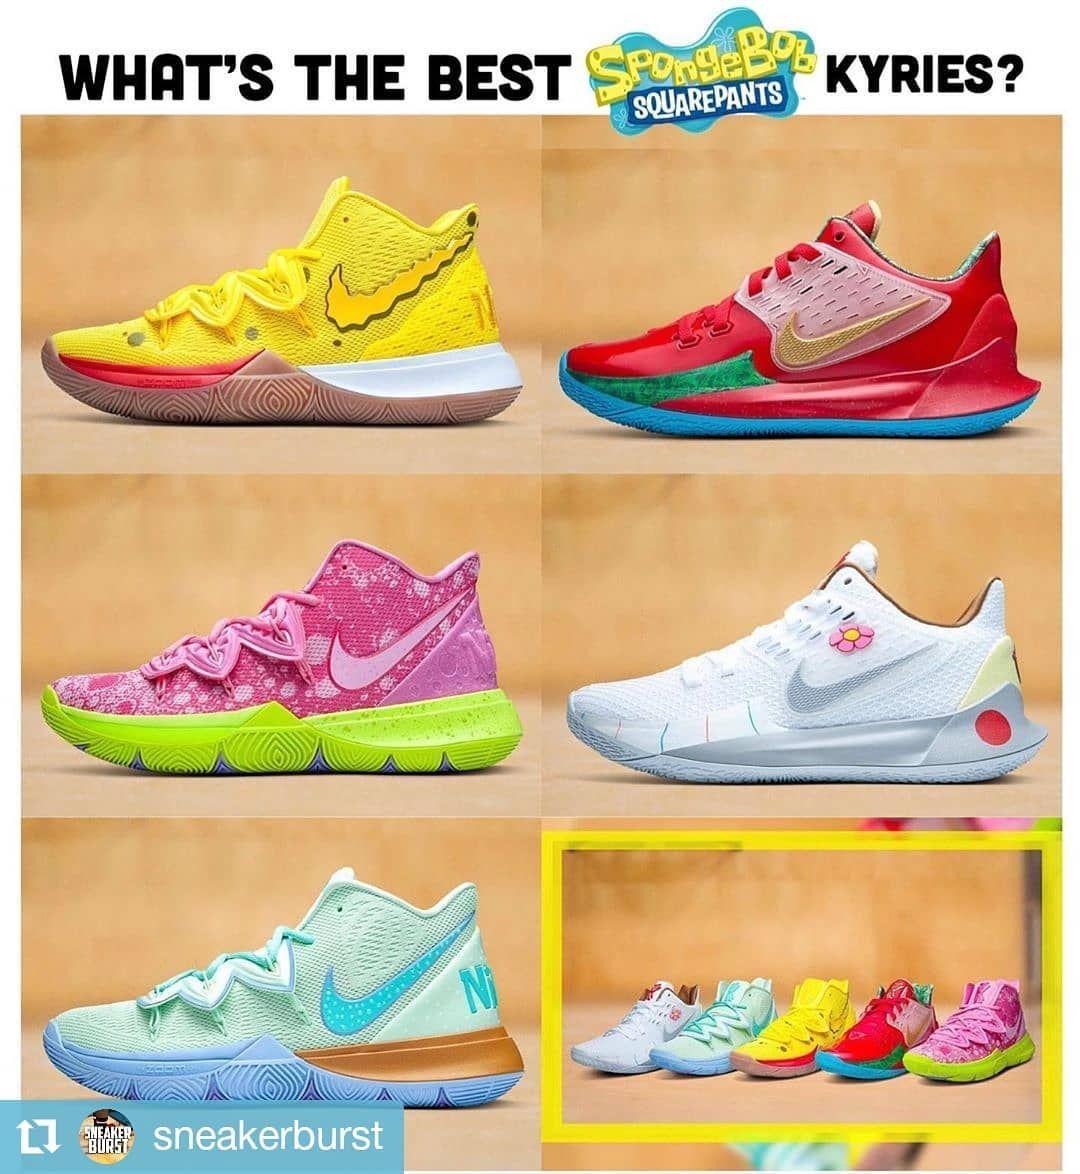 Kyrie irving shoes, Nike basketball